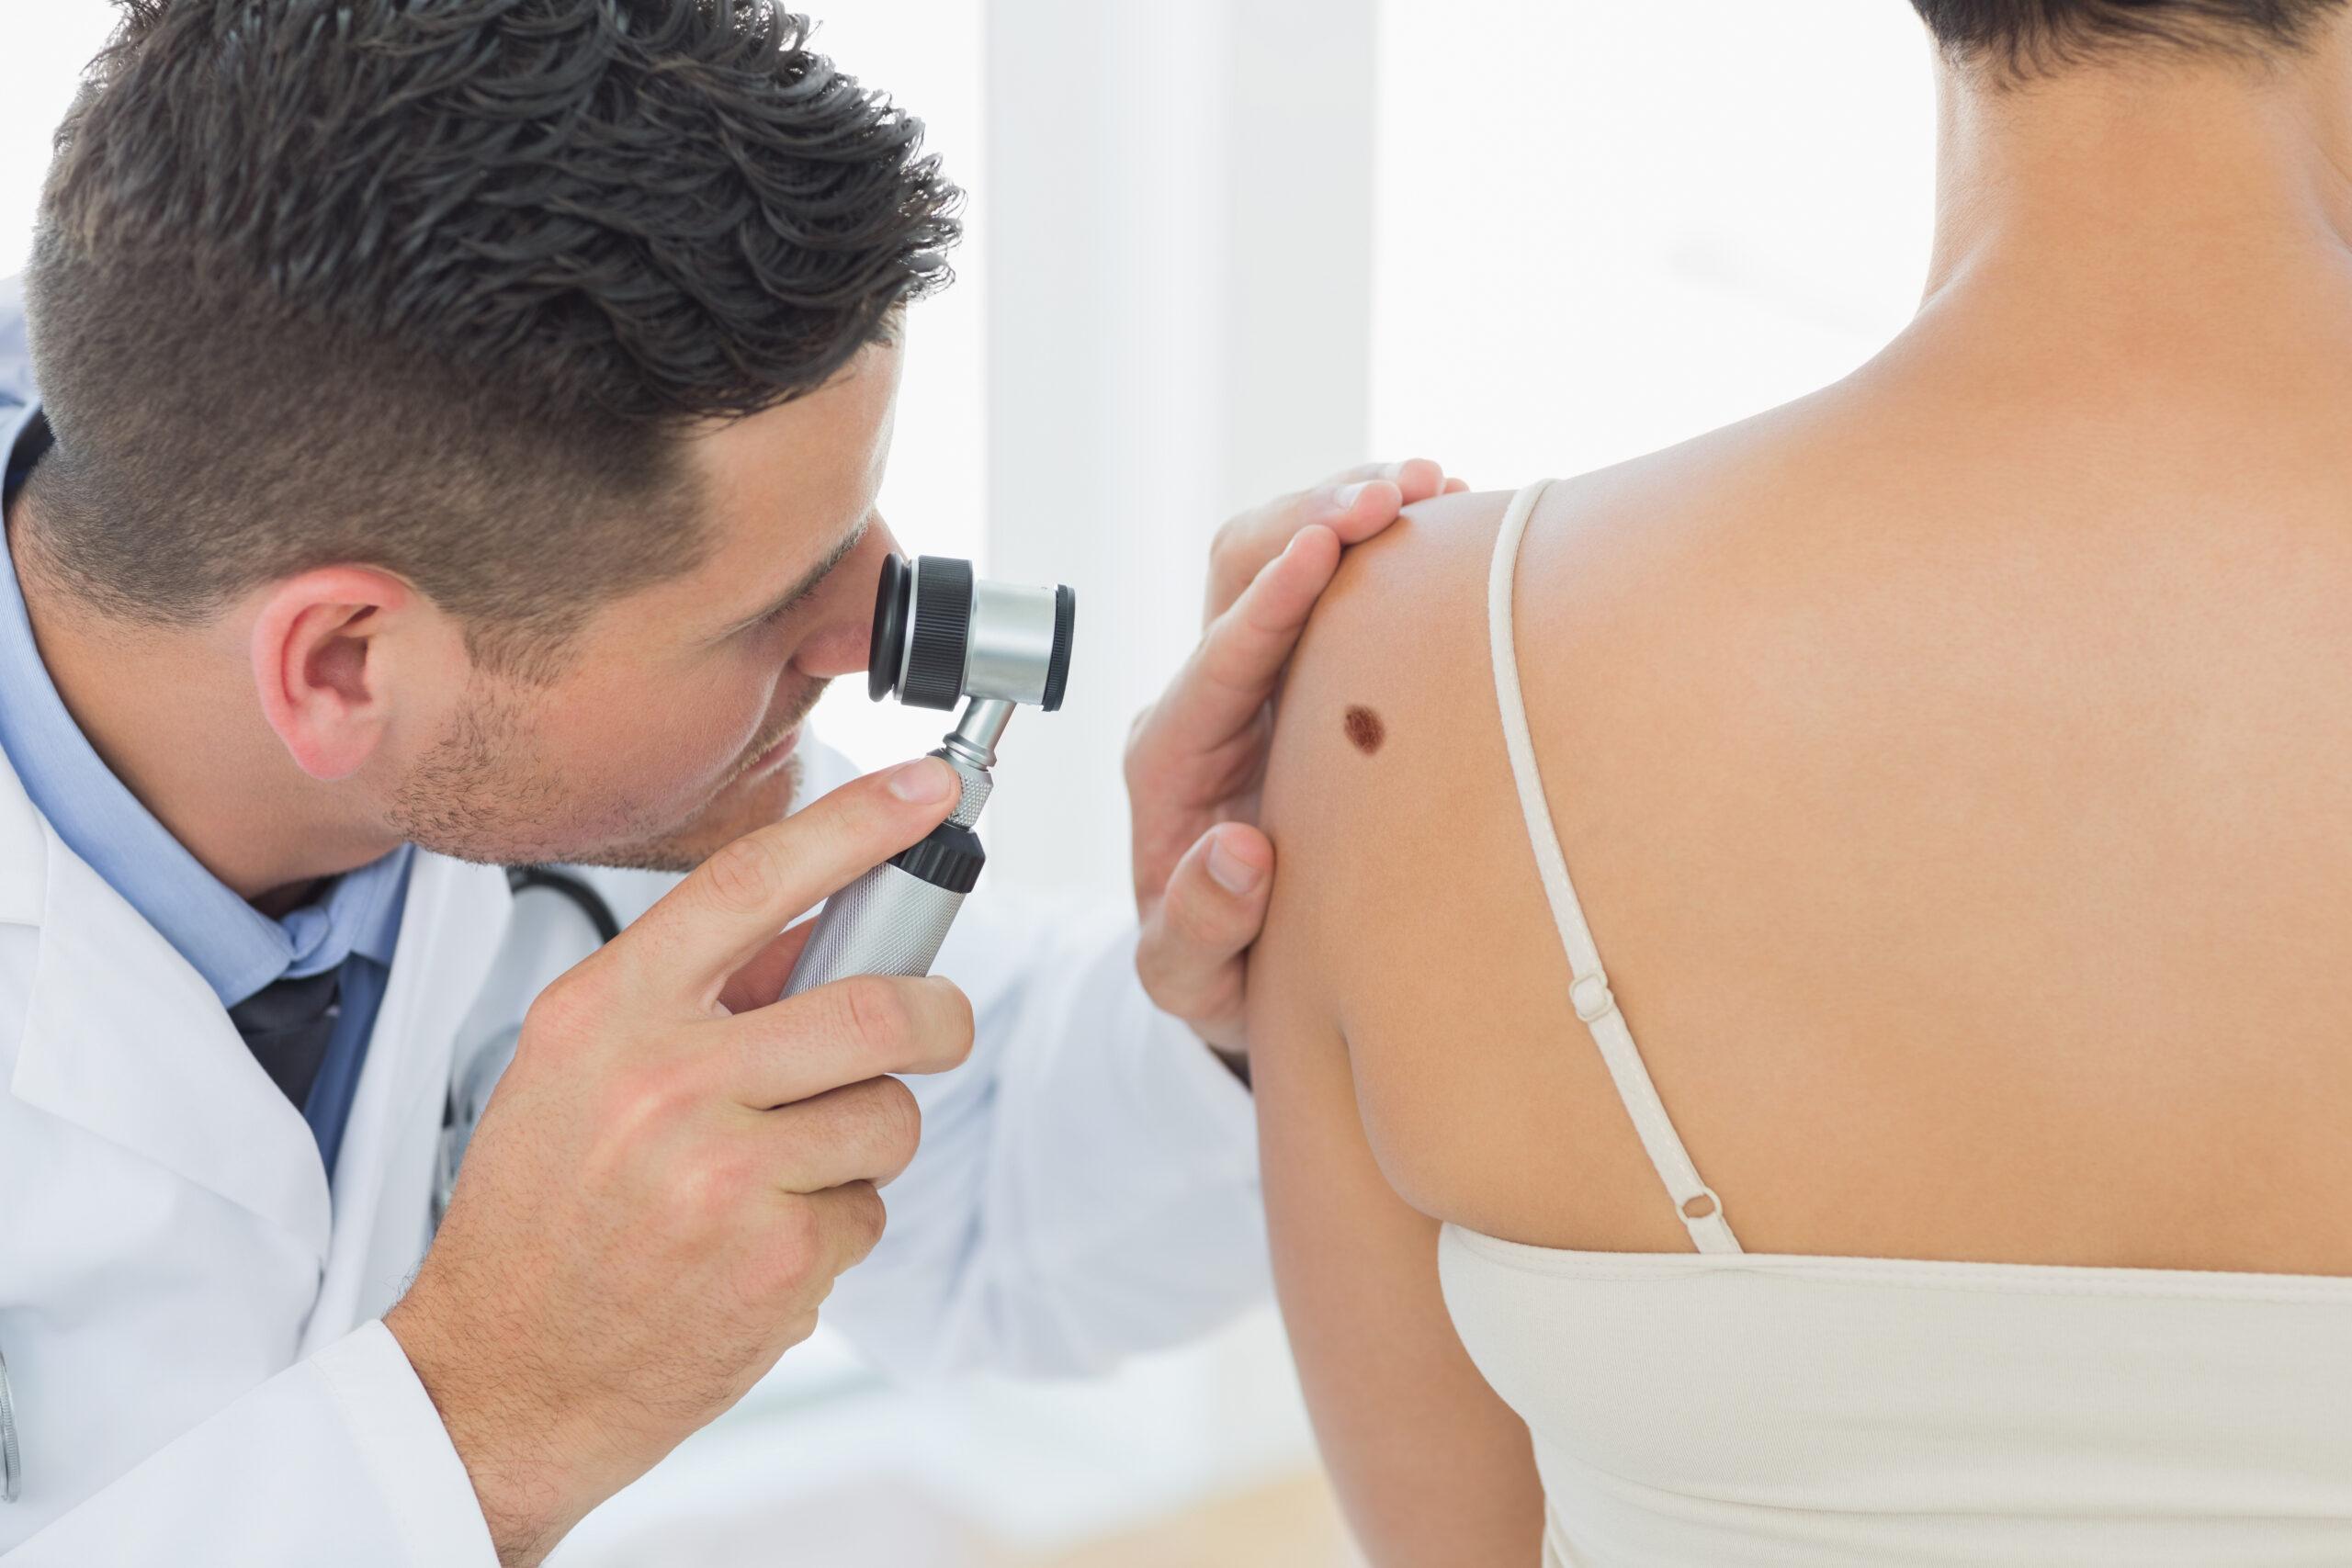 Dermatologist Marketingt